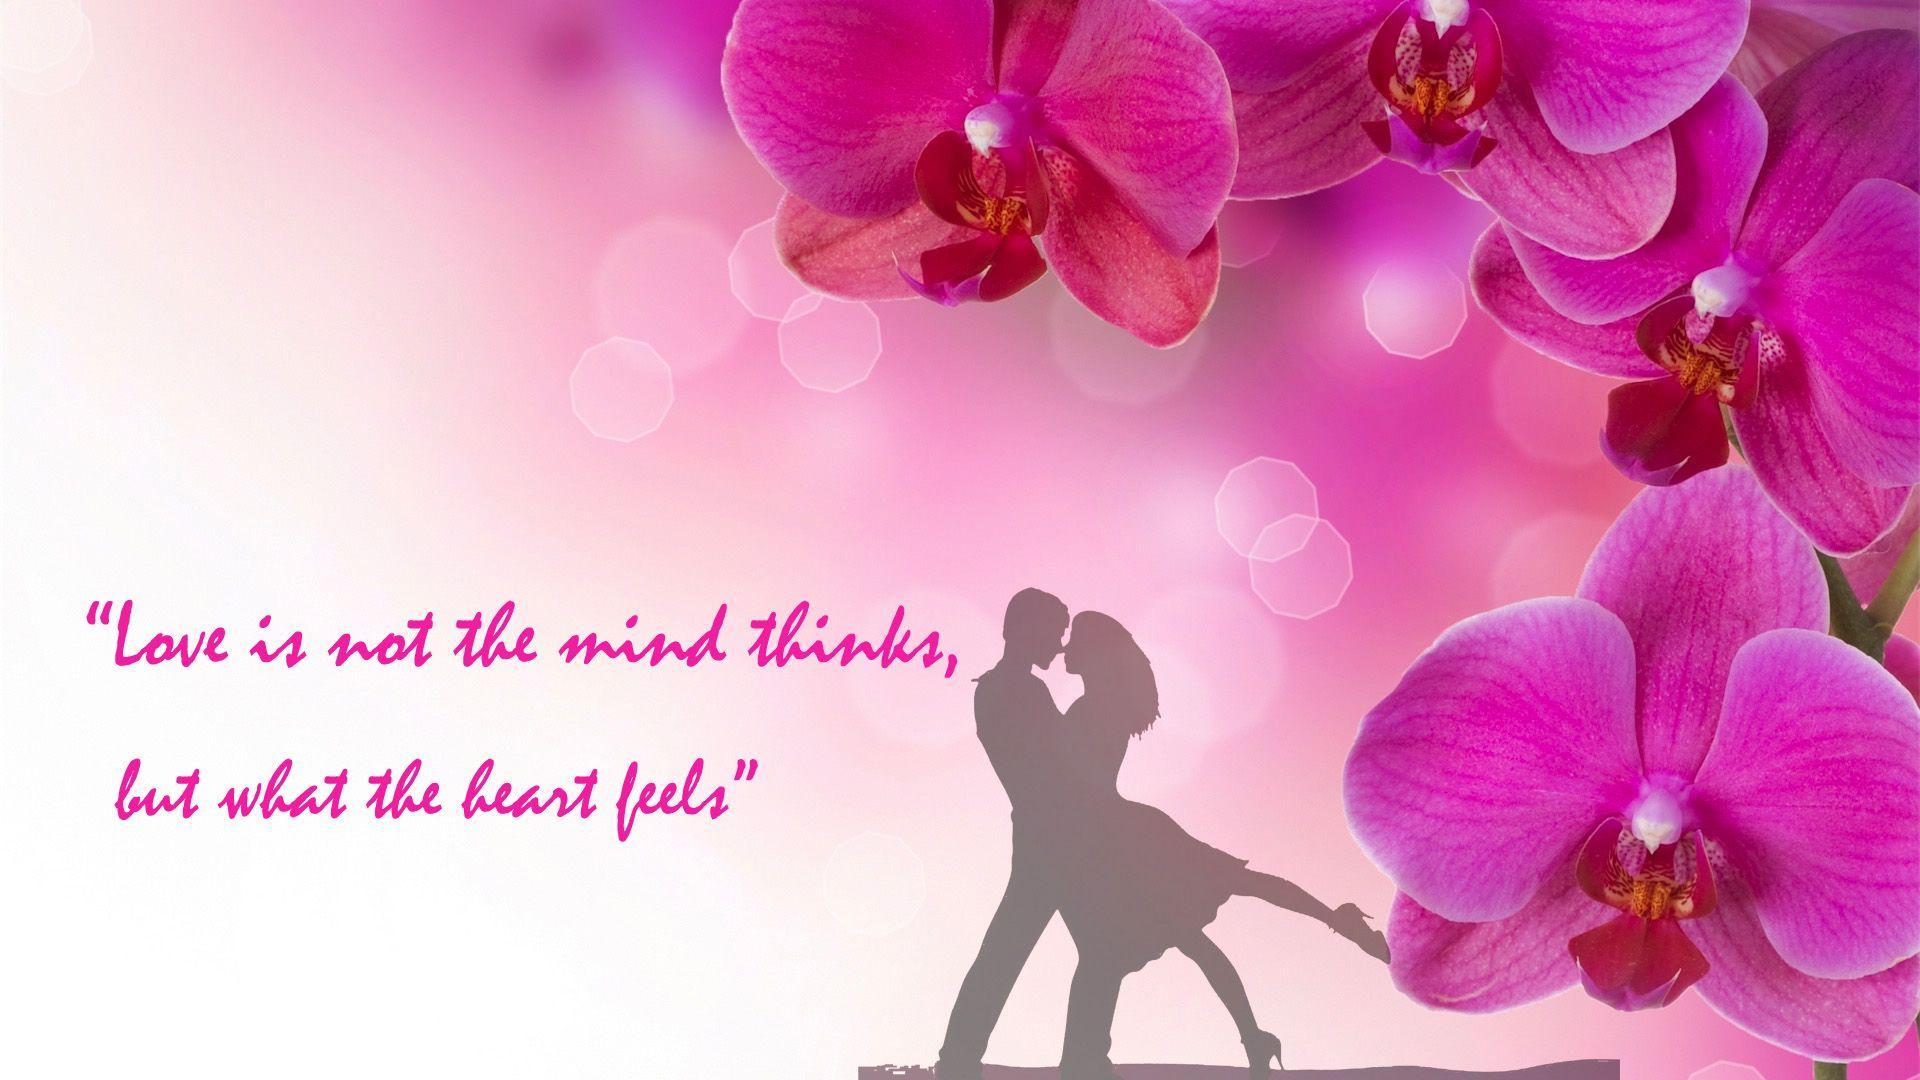 Love Pink Orchid Flower Romantic Wallpaper 24 3687 Hd